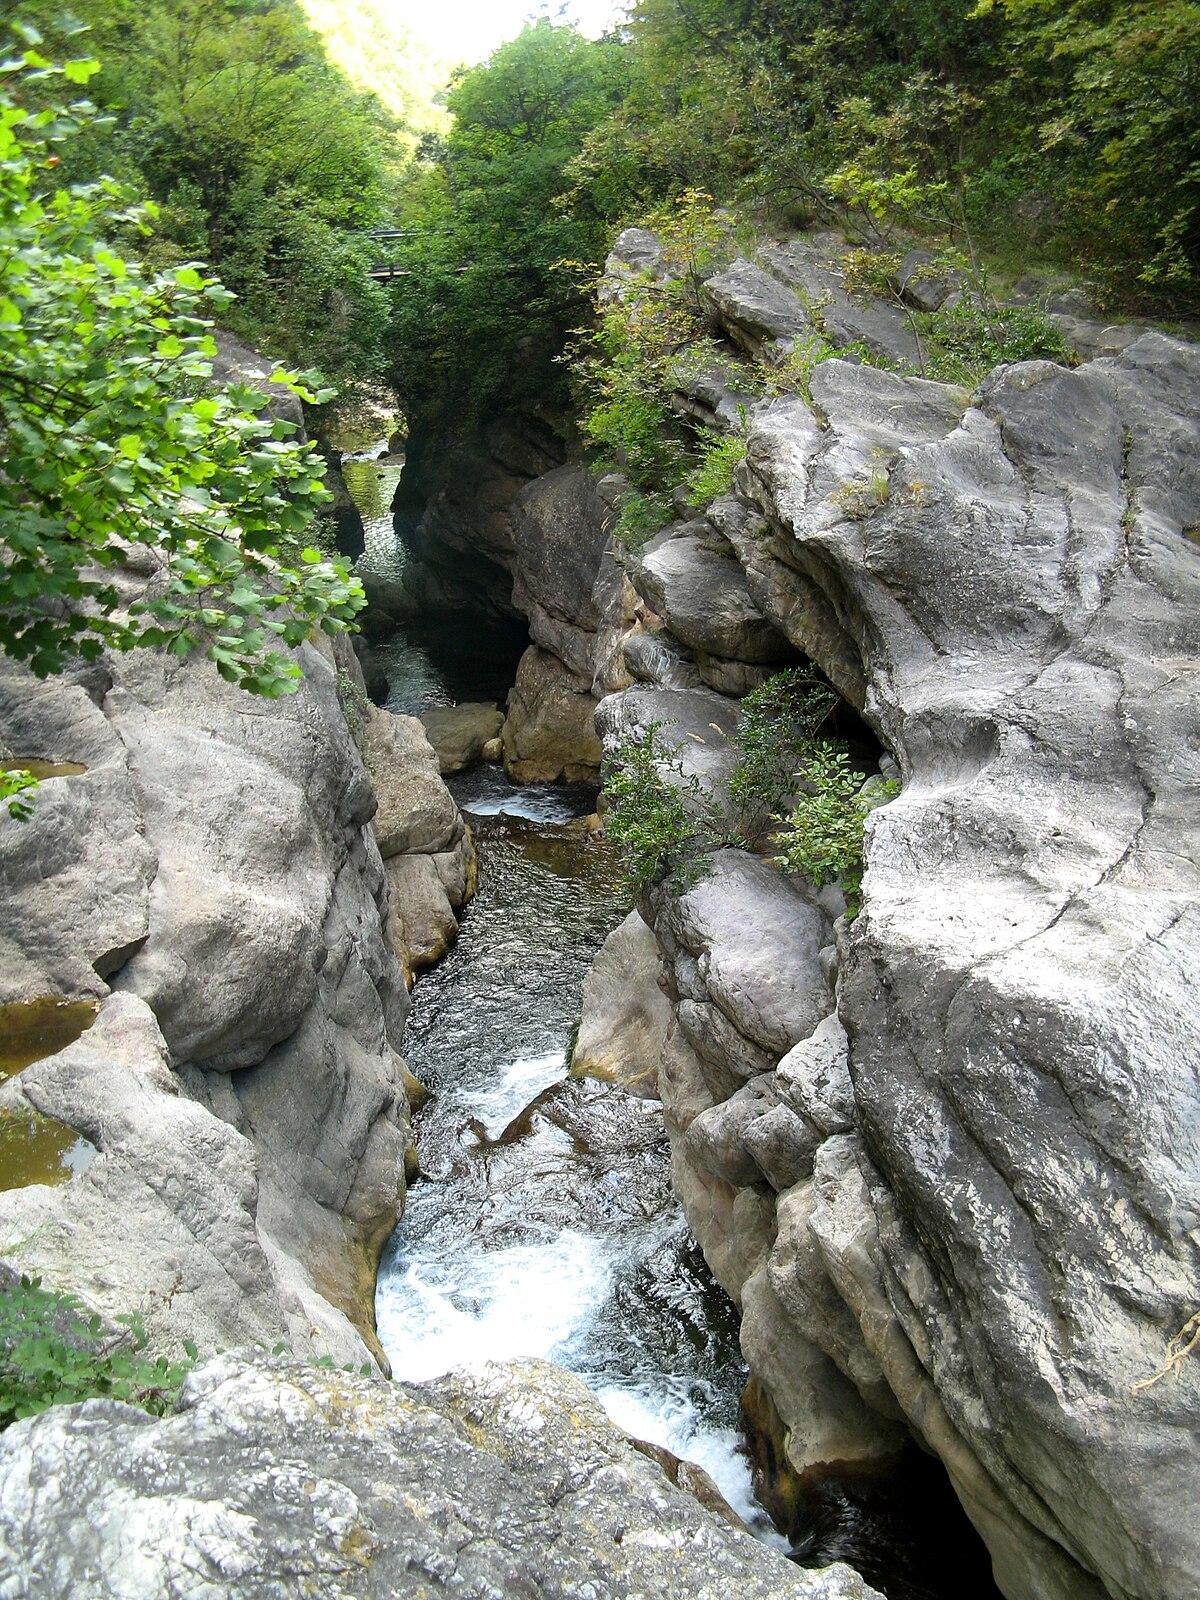 loup du gorges river wikipedia france alpes maritimes native